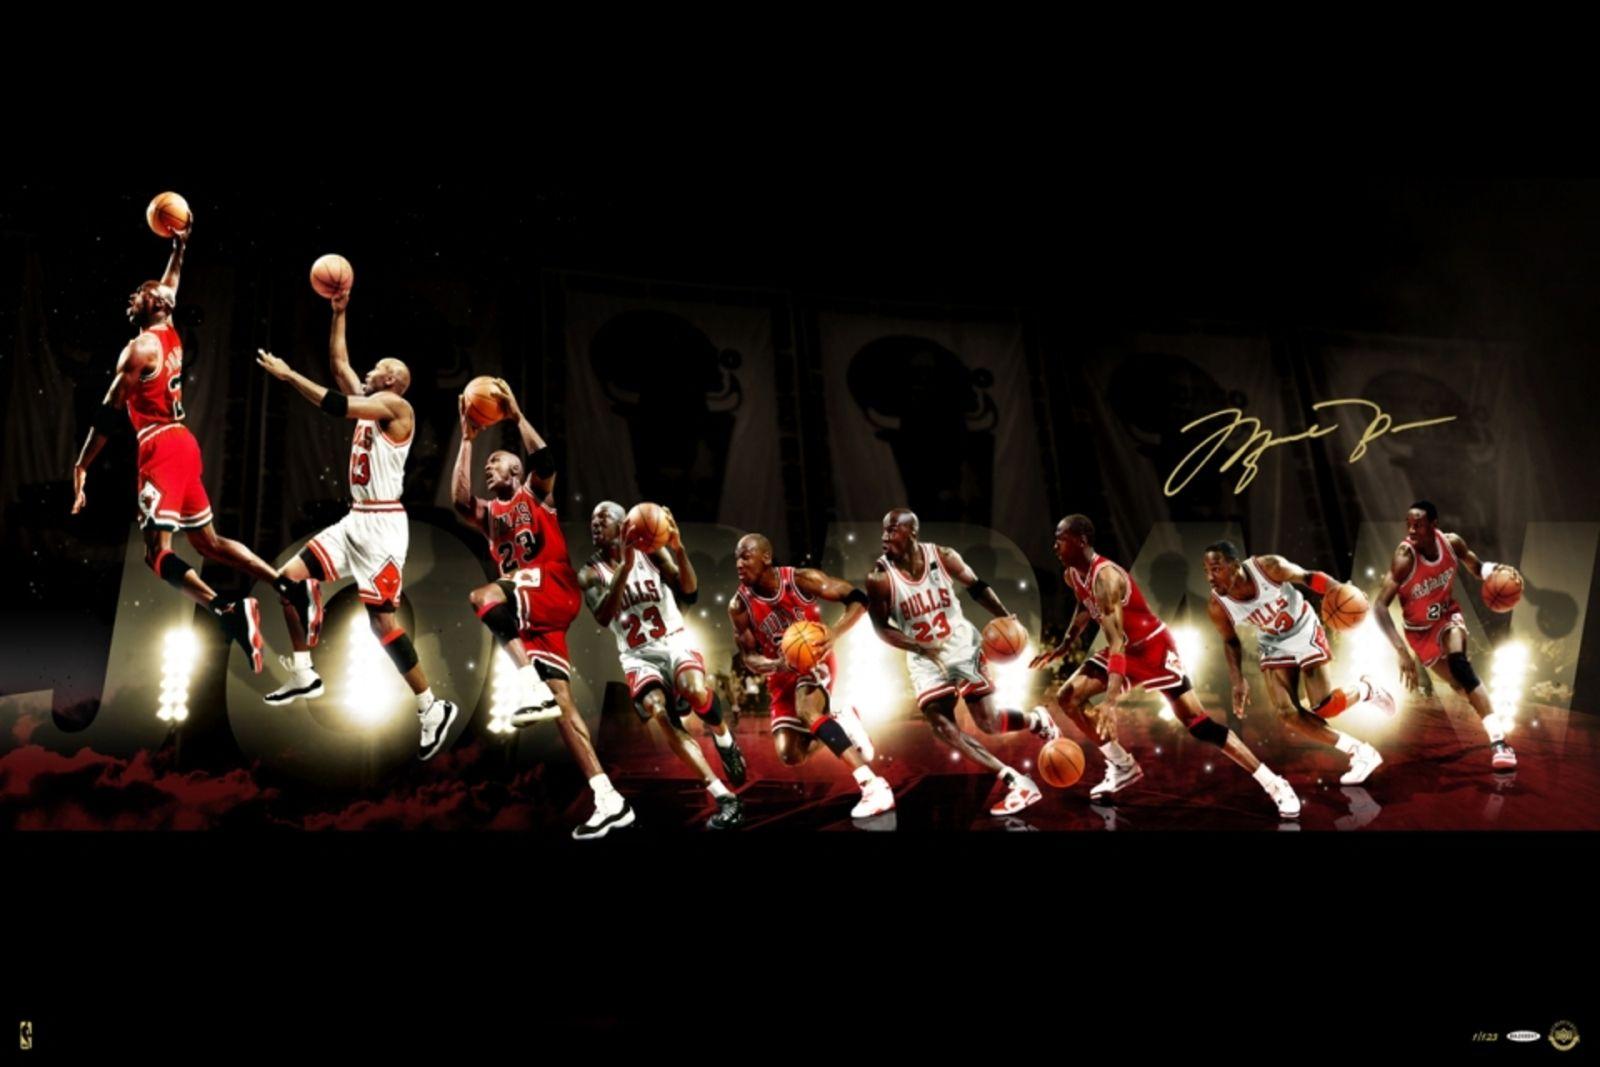 Sports Wallpapers Desktop K High Definition Pictures